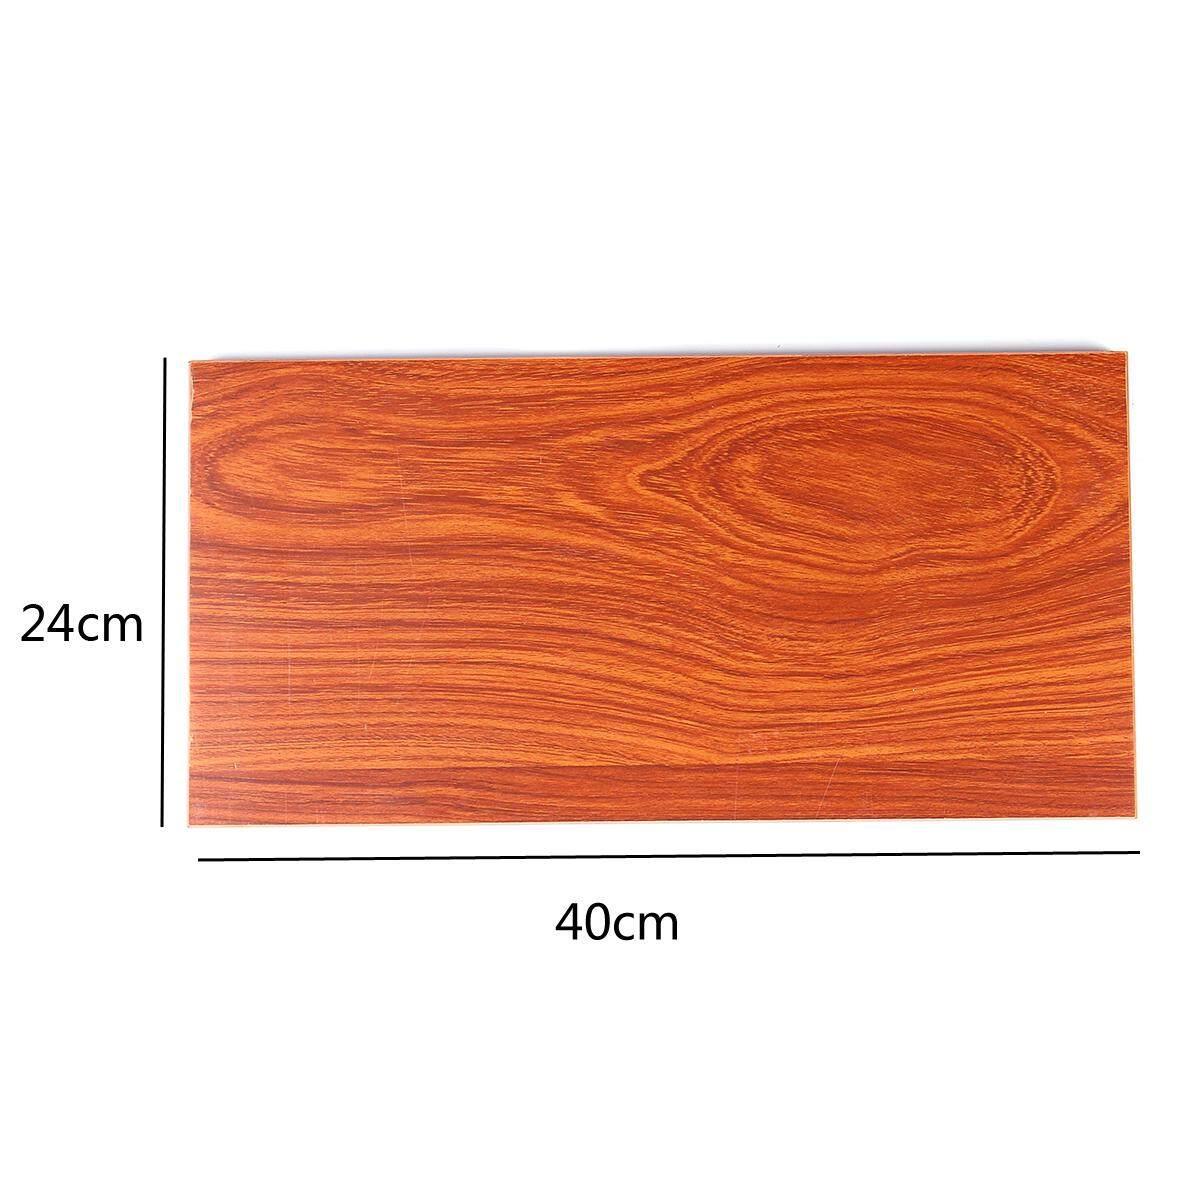 1Pcs 24cm×40cm Wall Shelves Vintage Solid Wood Board Panel Shelf Kit Bookshelf Wall Mount for Home Decor